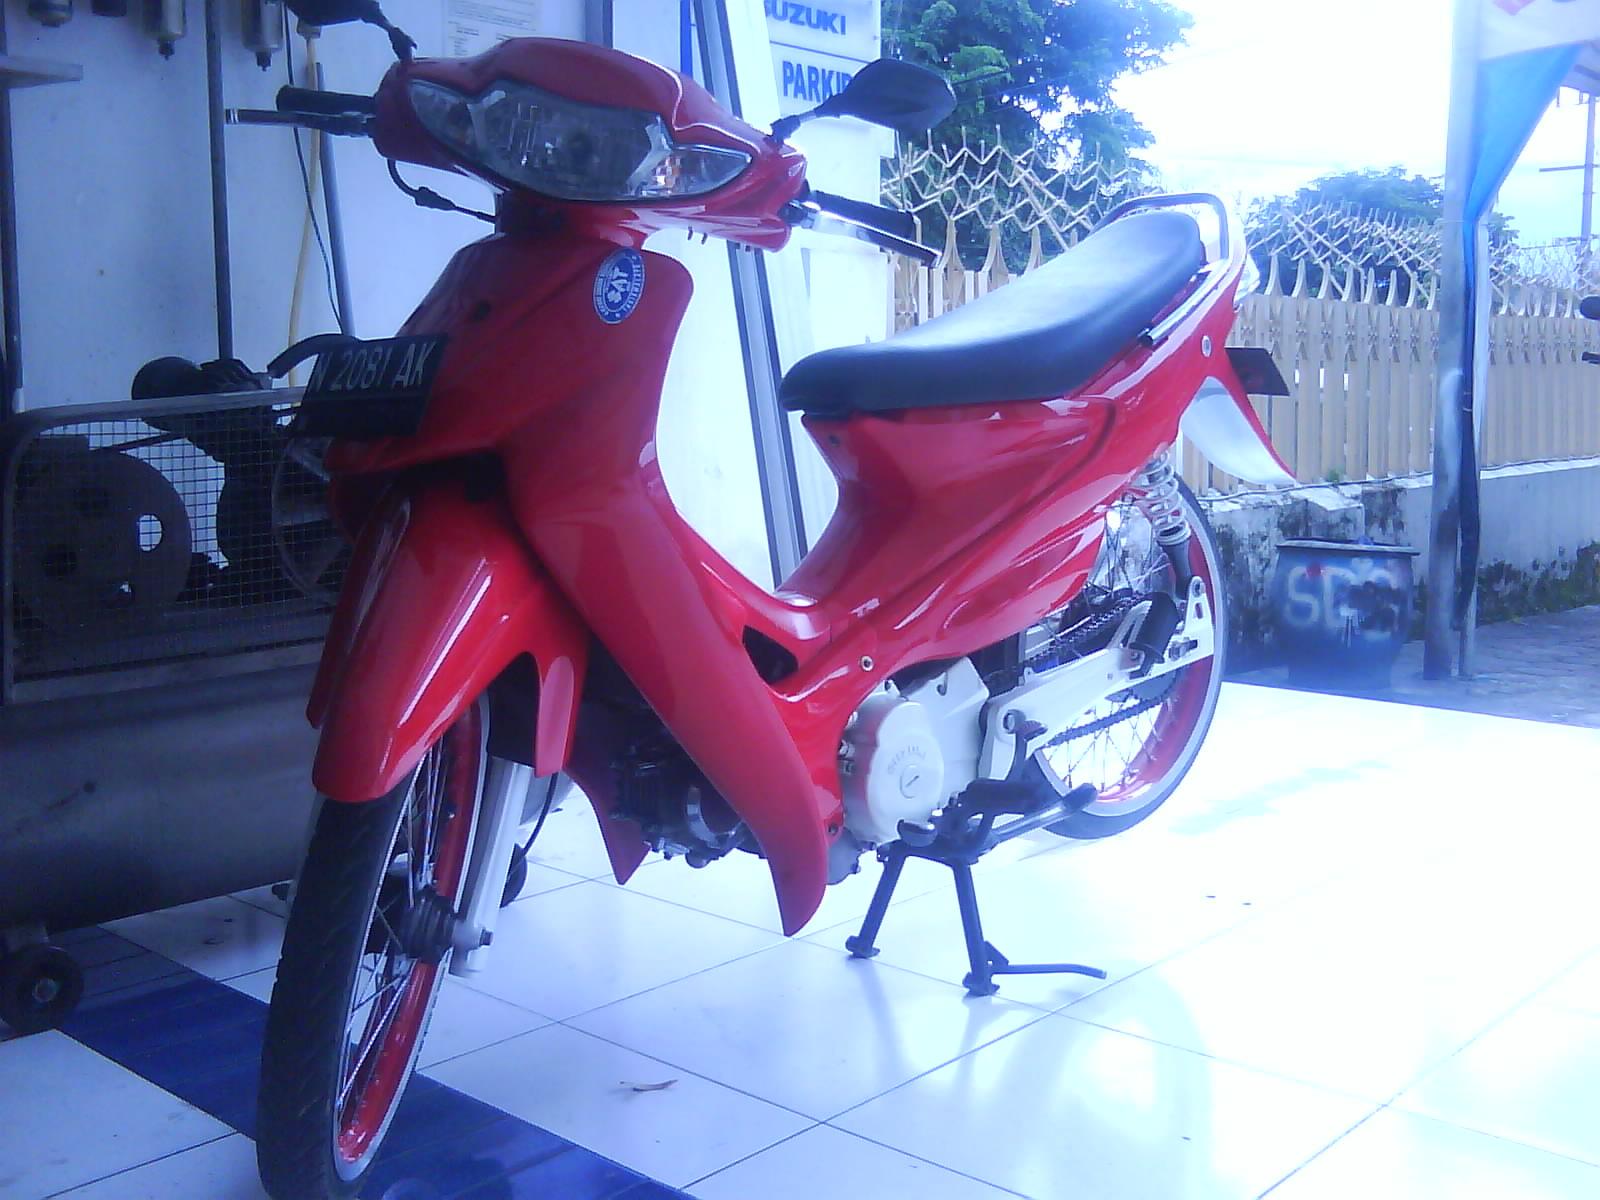 Modif Motor  Suzuki Smash Modification At Malang Indonesia